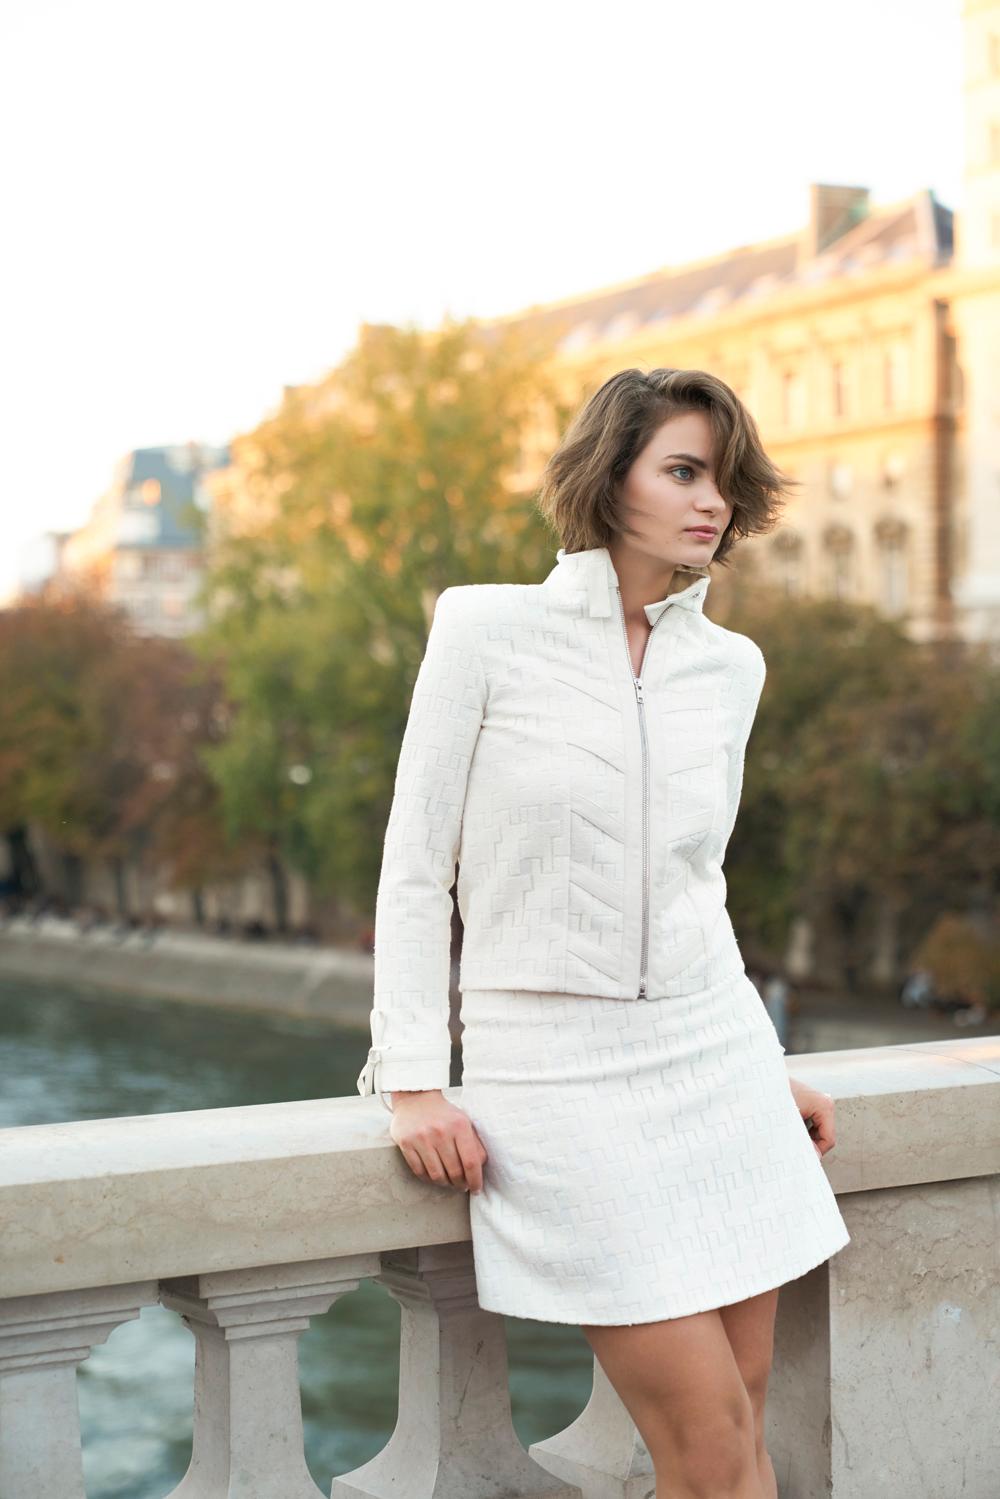 Veste blanche jupe